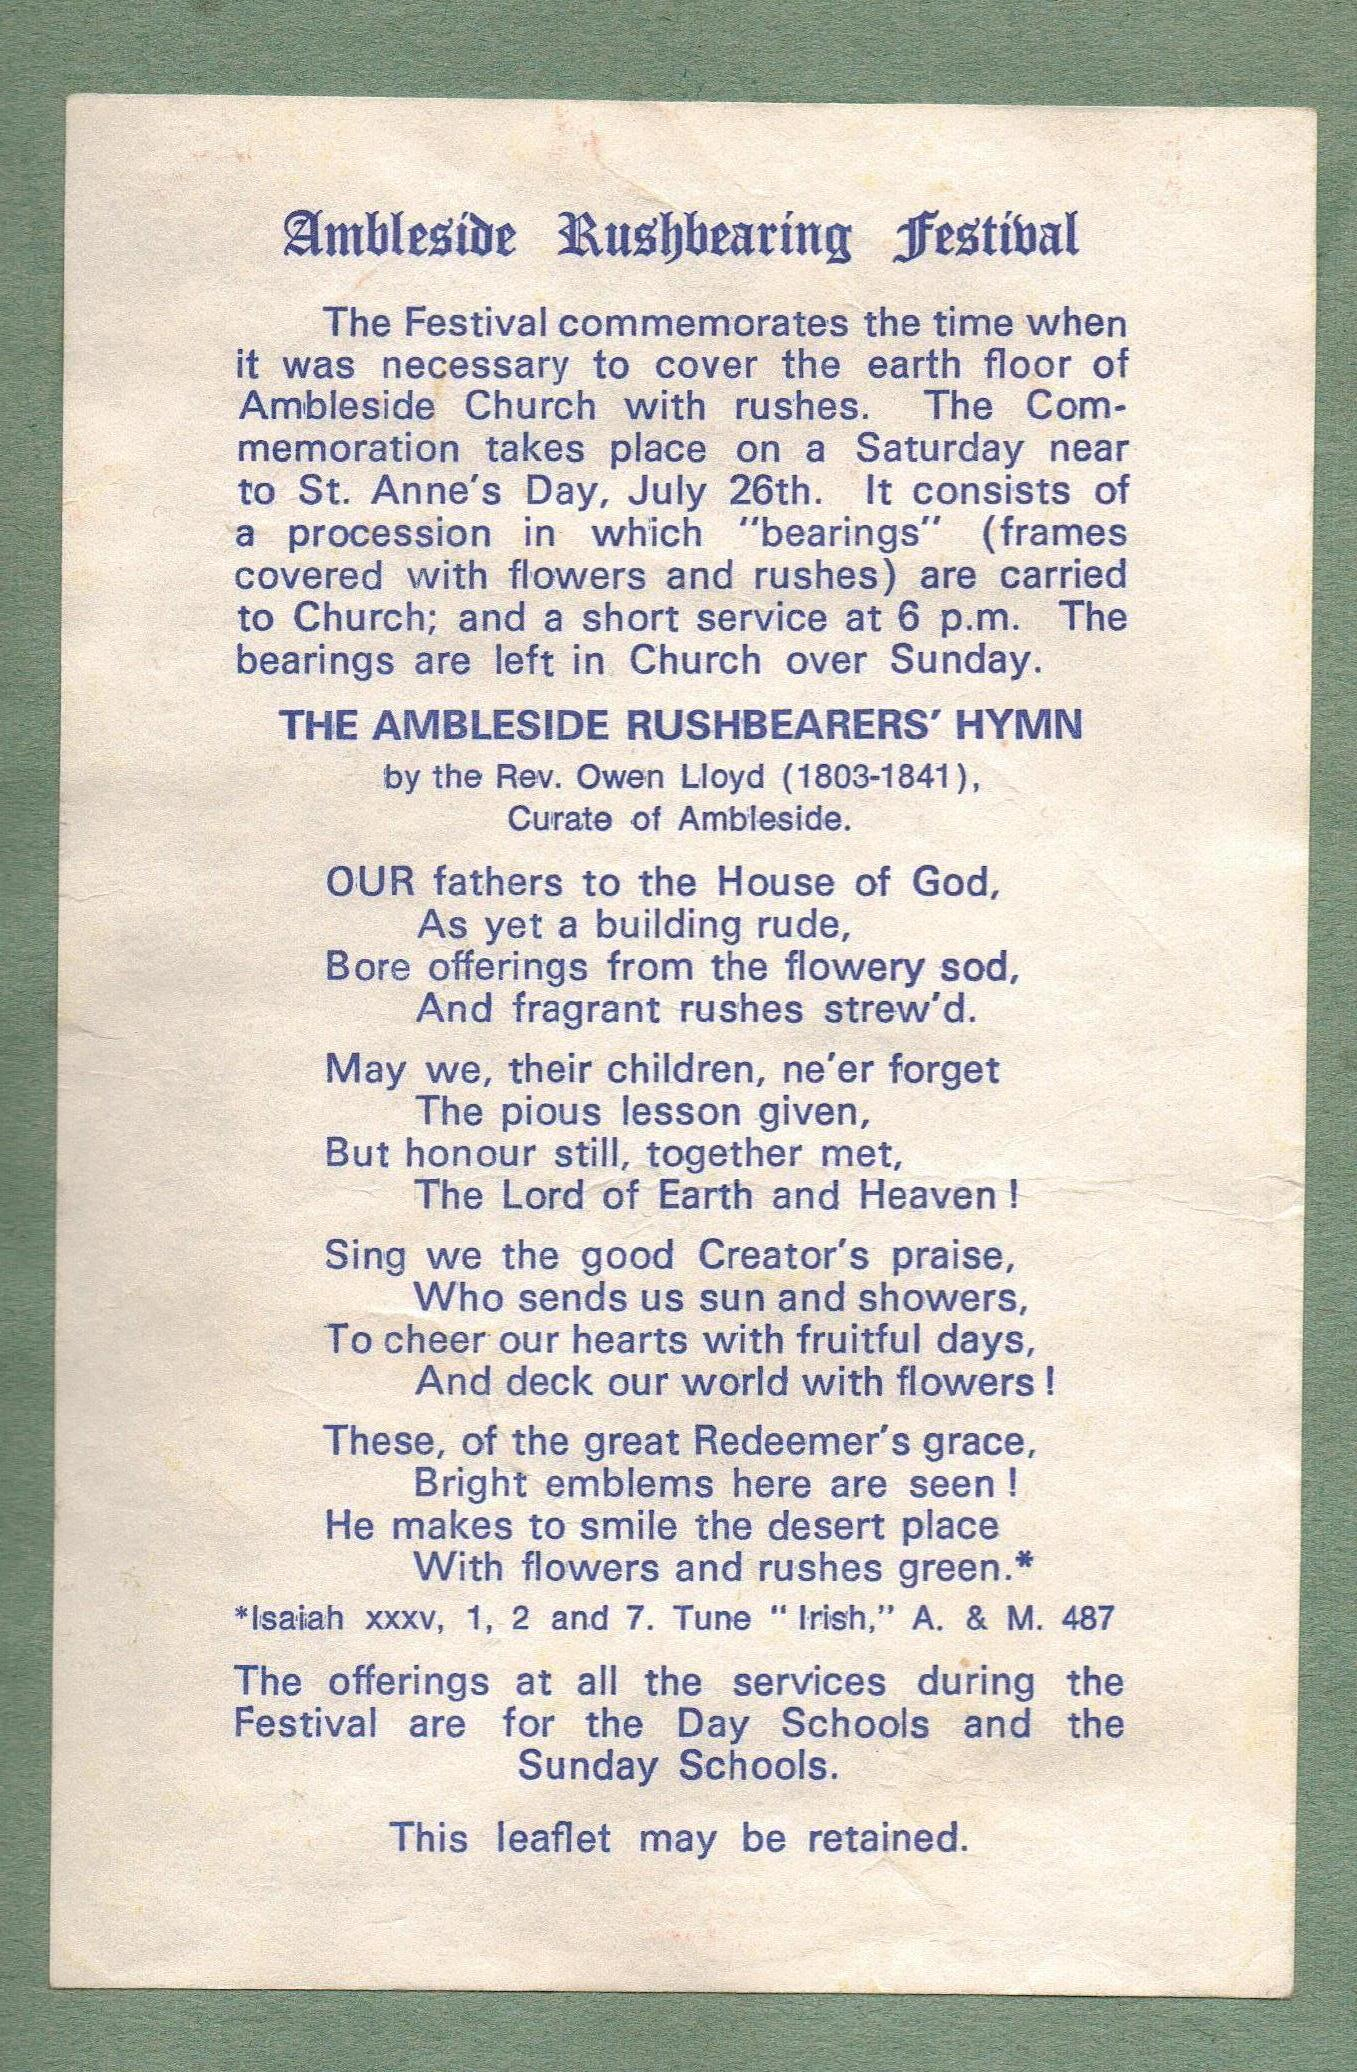 St Mary's Church Ambleside Rush Bearers' Hymn